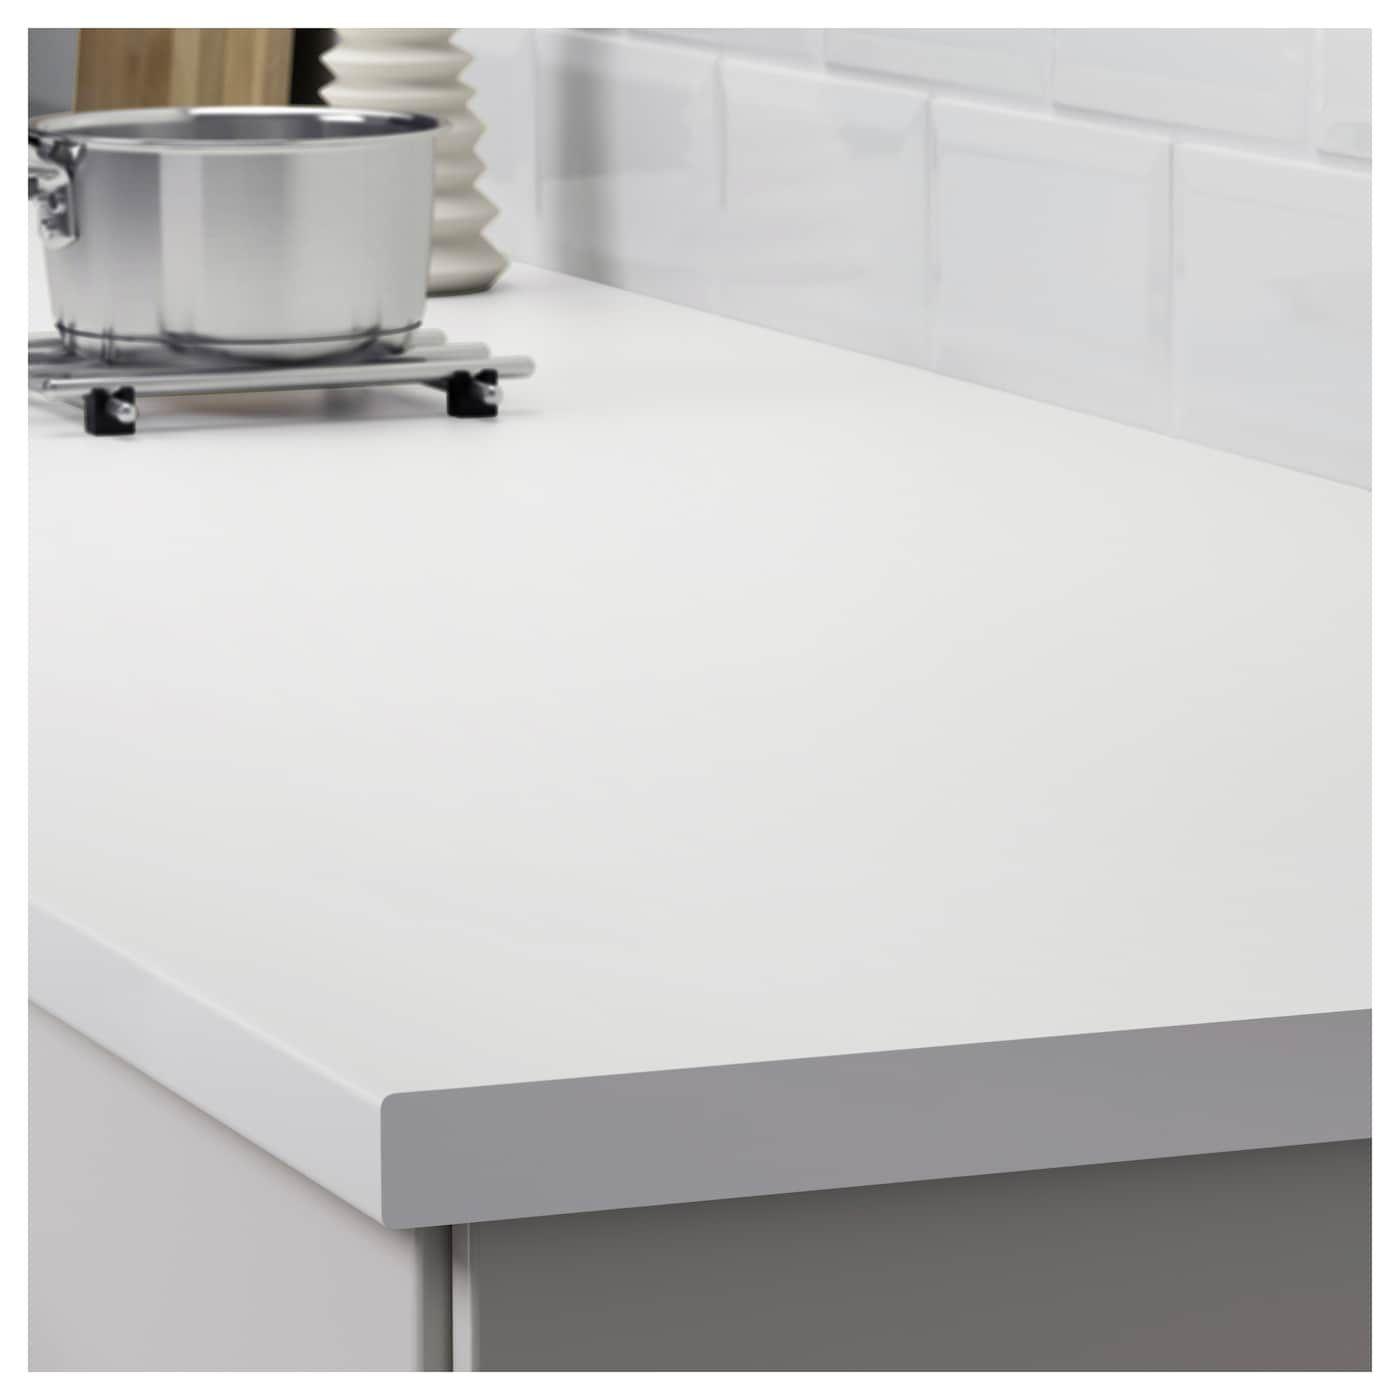 Lilltrask Countertop White Laminate 98x1 1 8 White Laminate